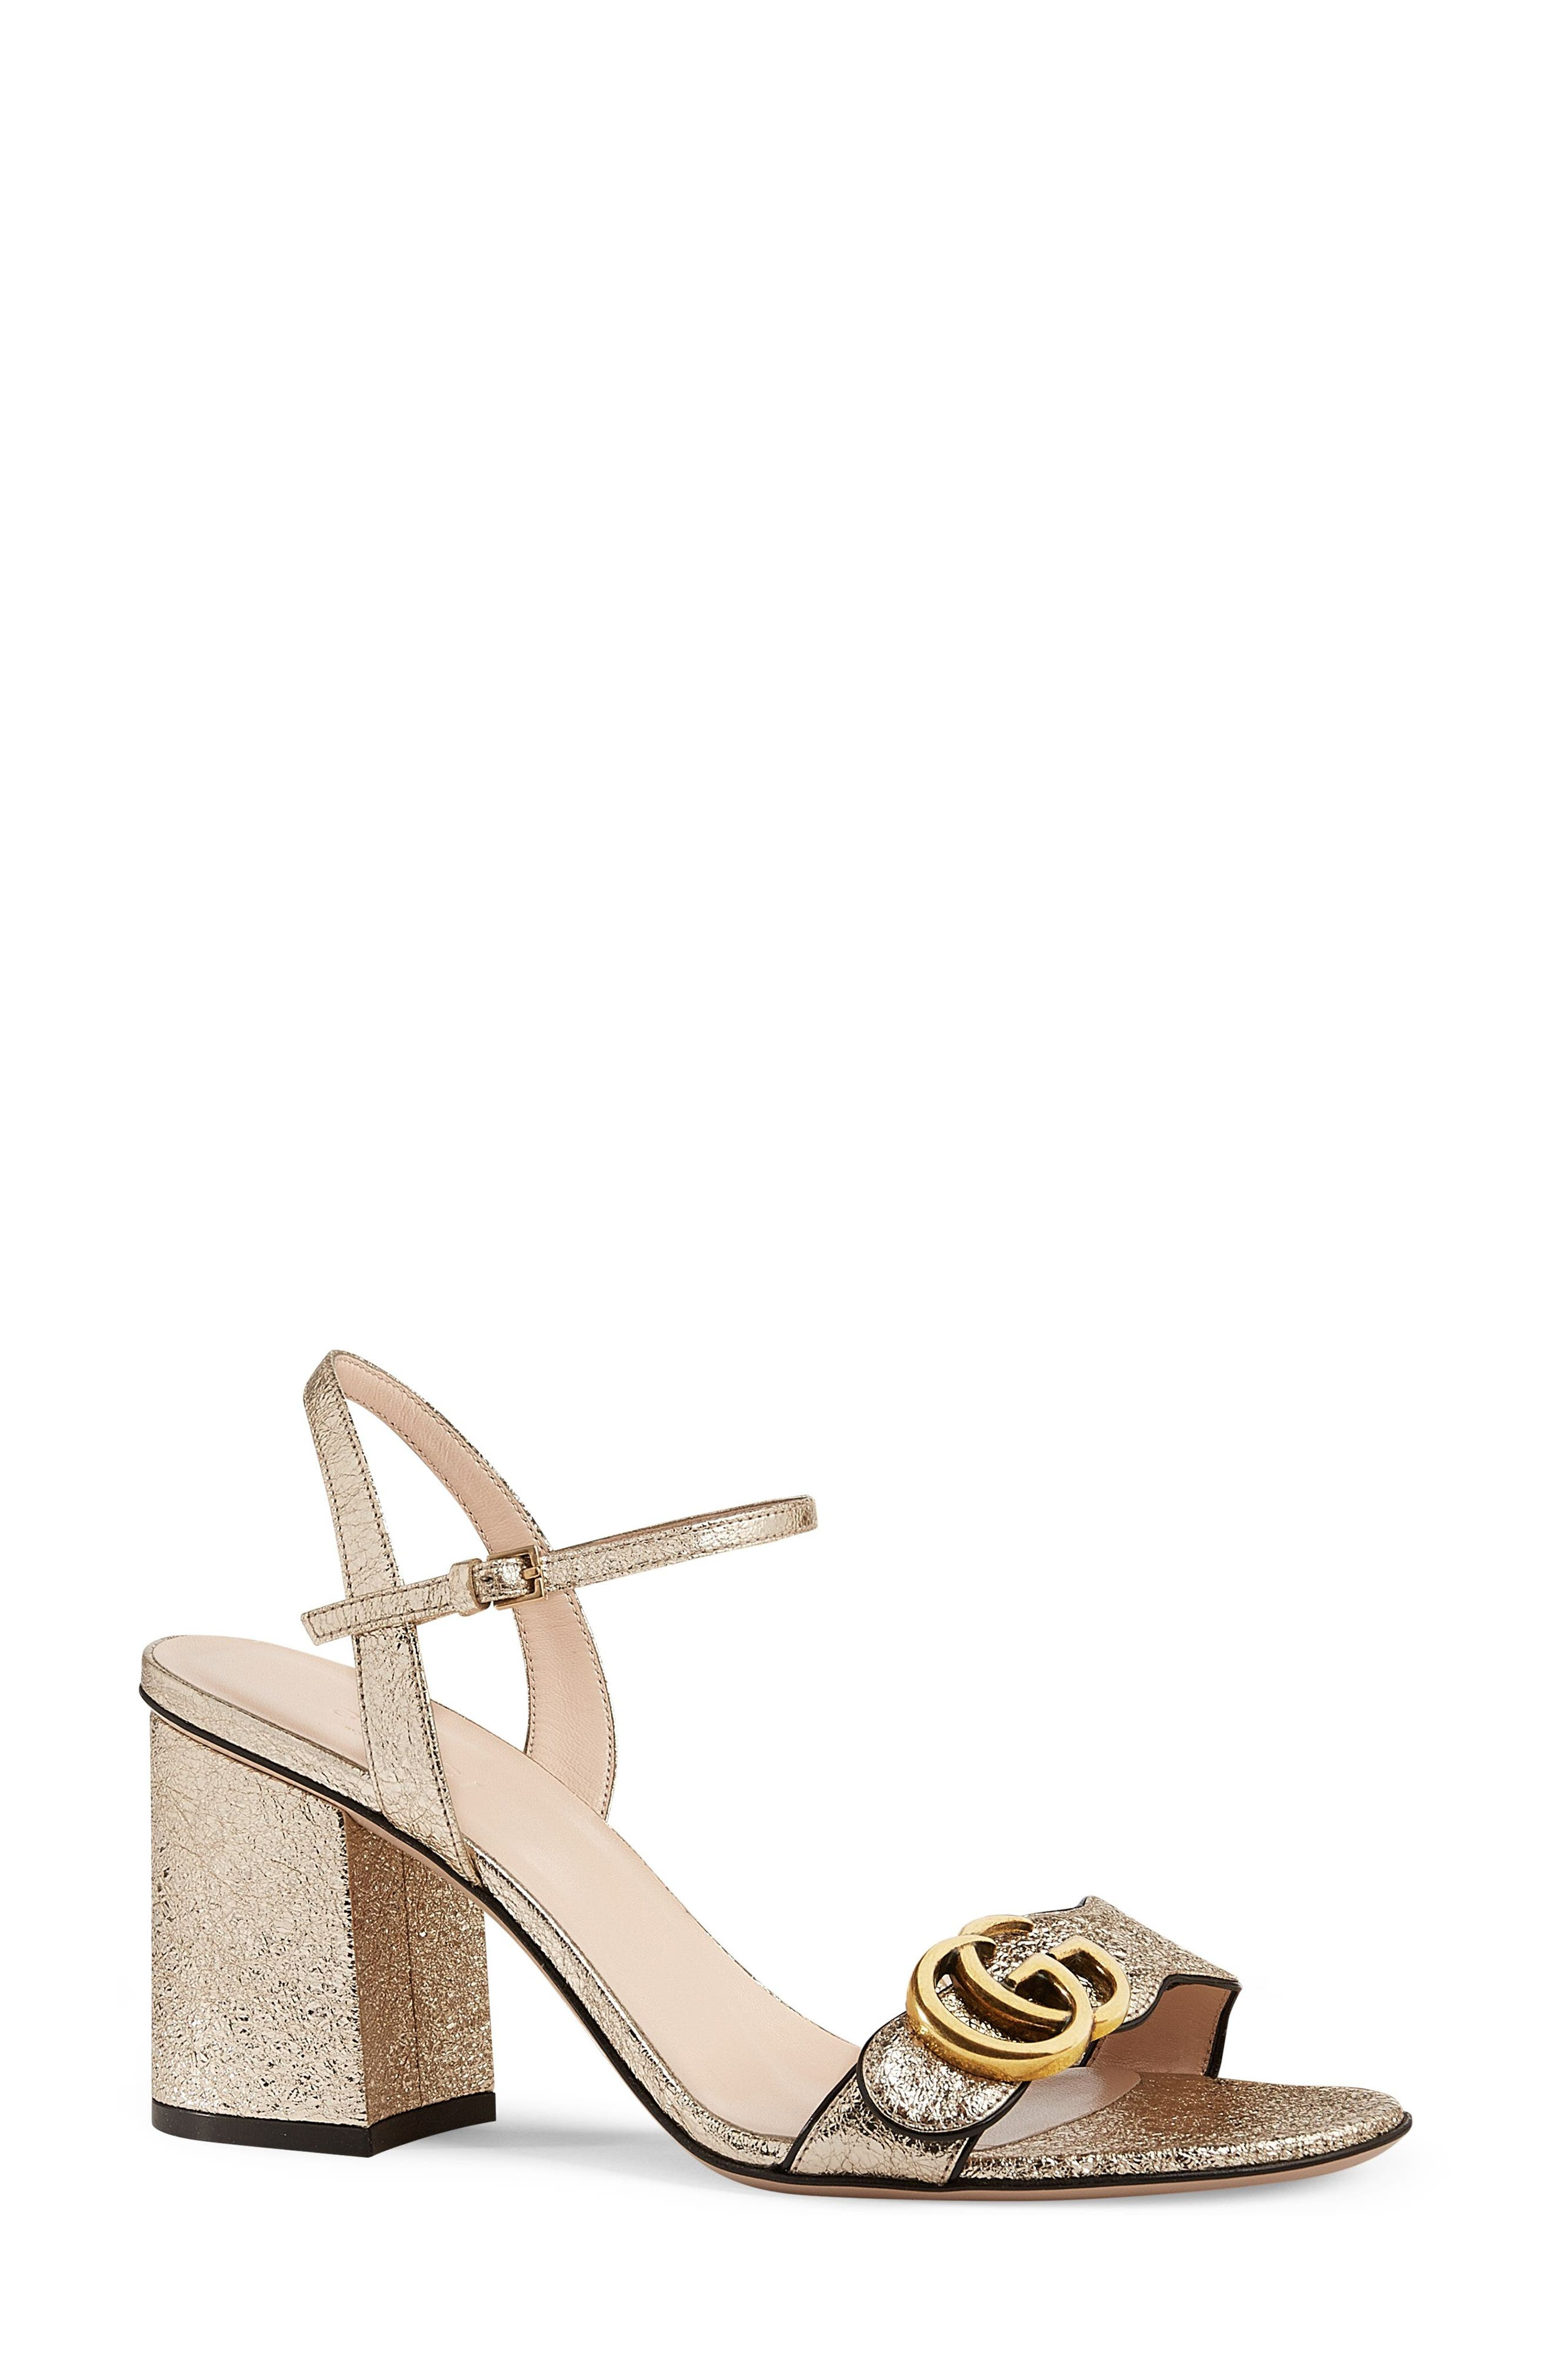 Main Image - Gucci GG Marmont Sandal (Women)